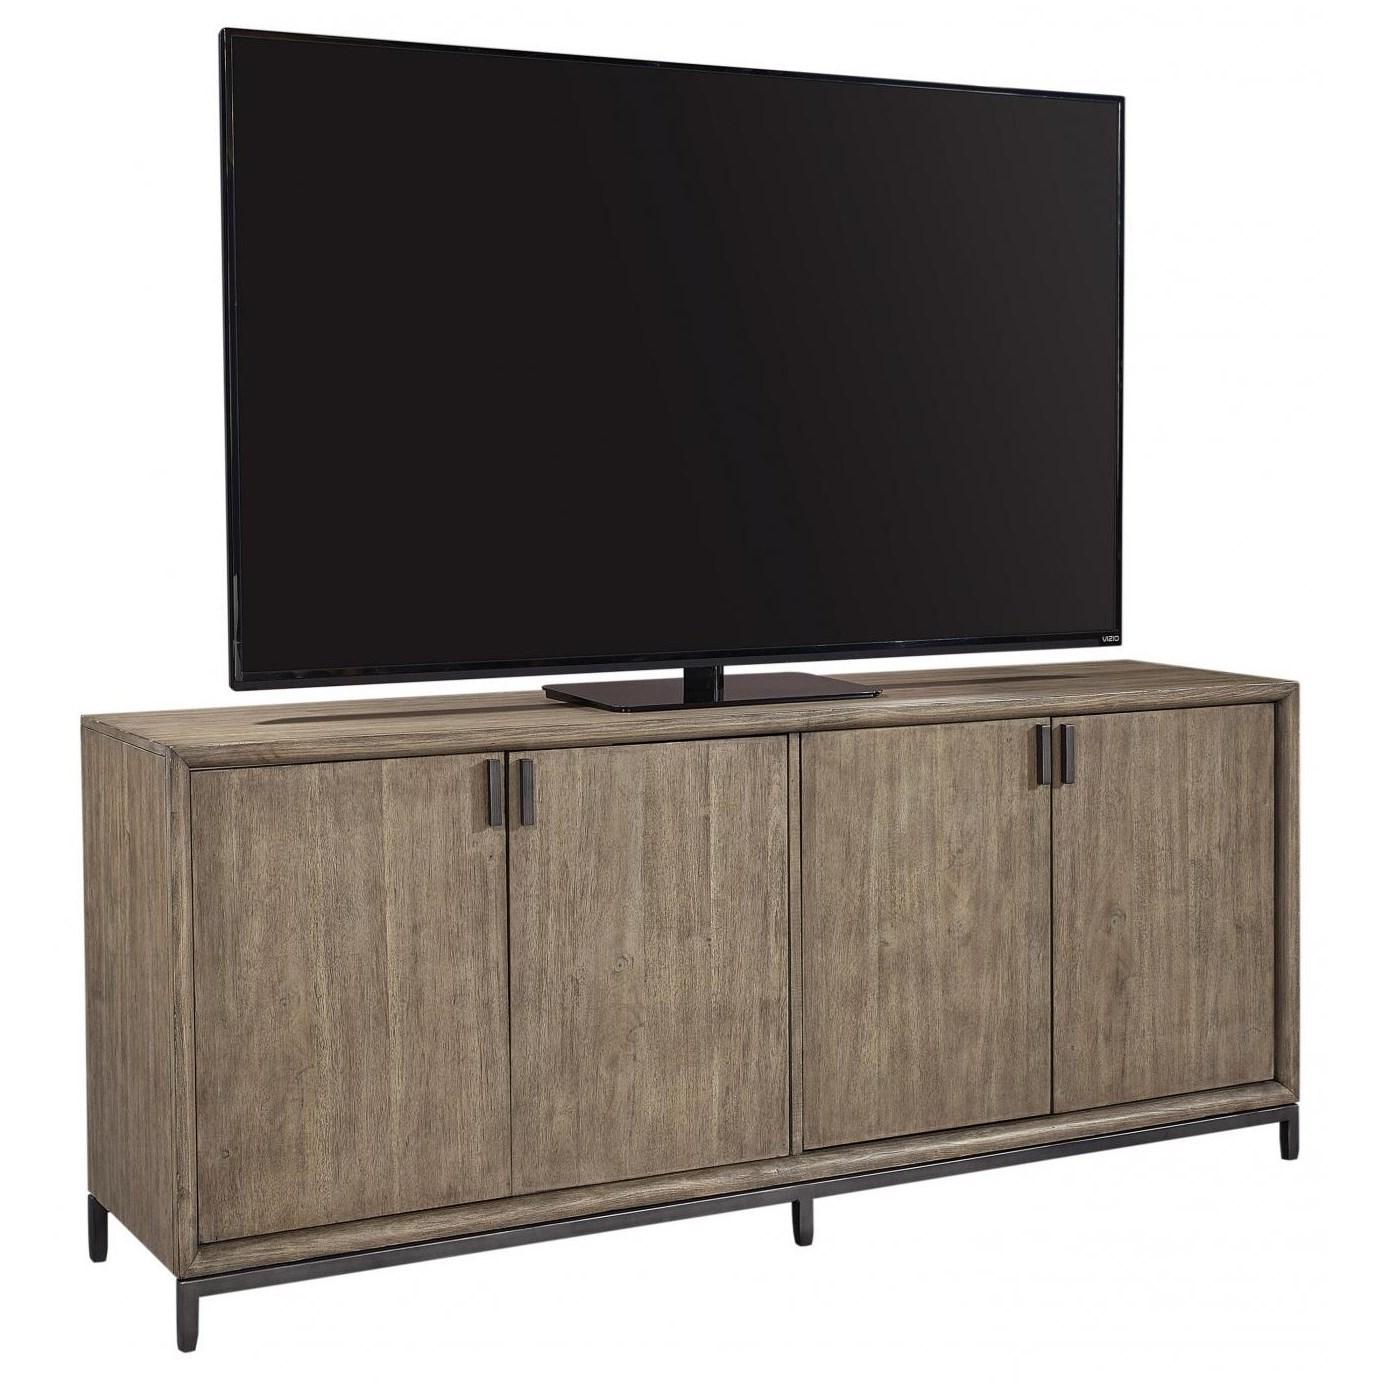 Trellis TV Cabinet by Aspenhome at Baer's Furniture